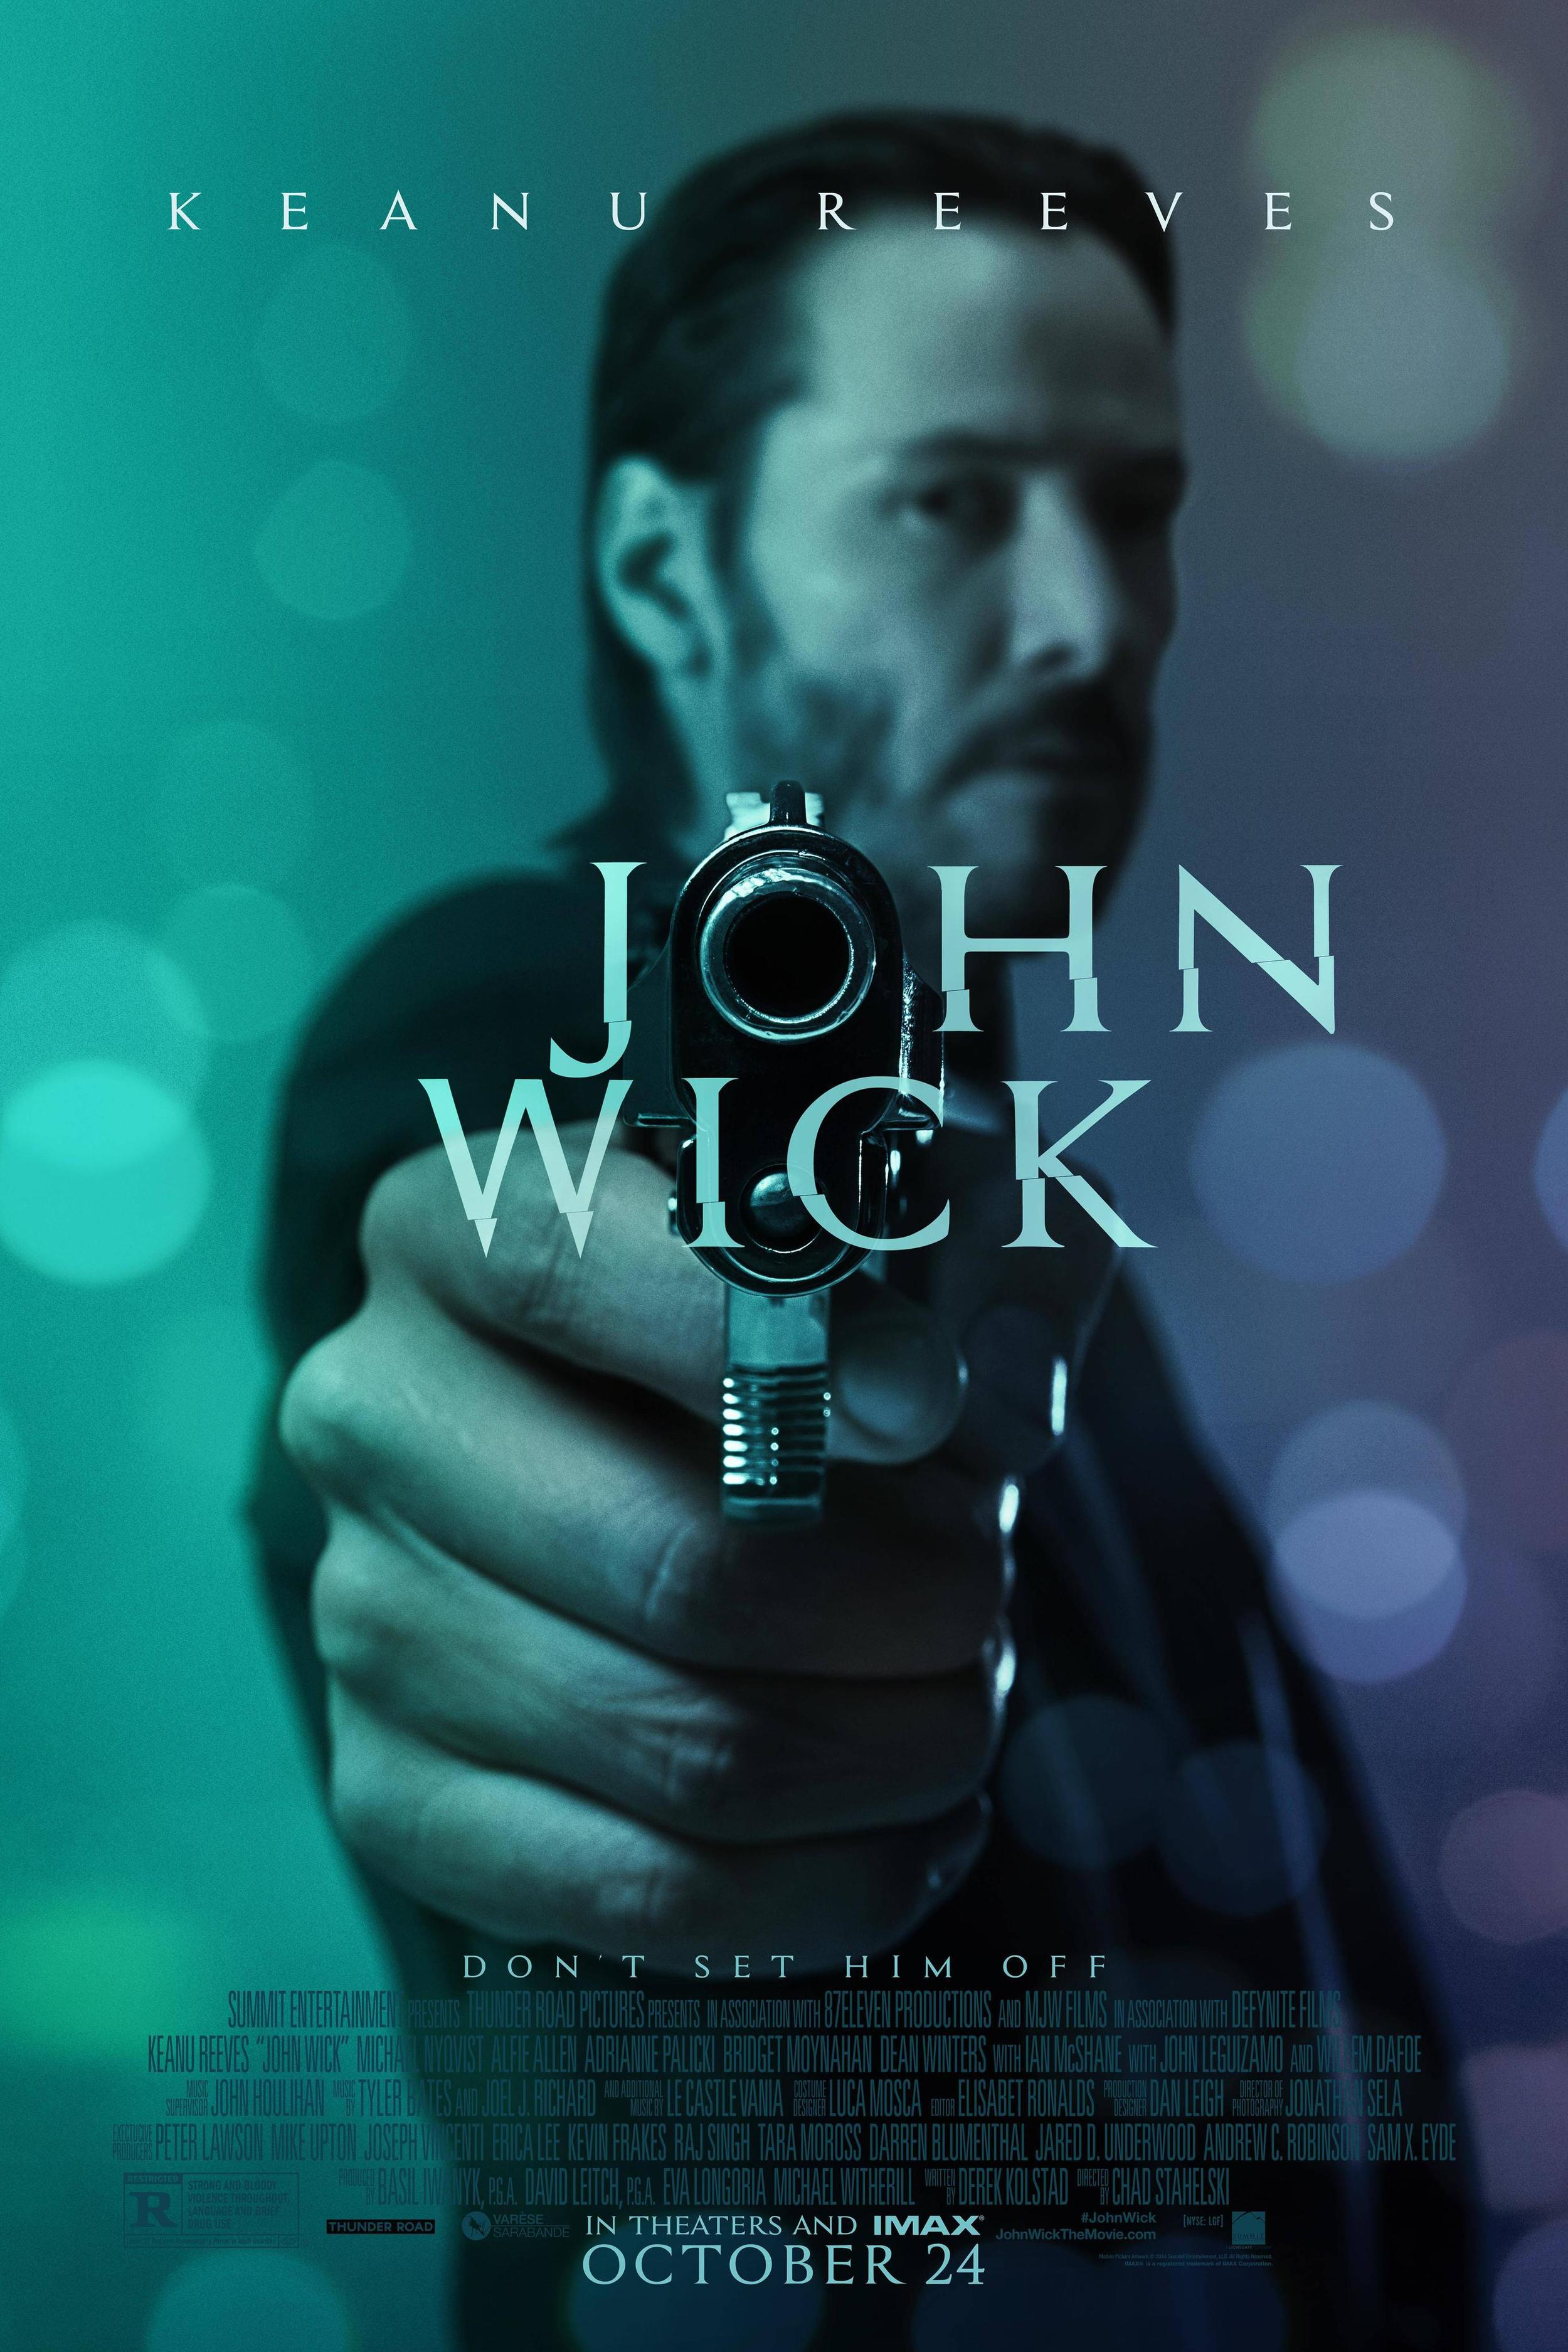 john-wick-imagens-2-win-assassin-s-creed-a-john-wick-t-shirt-poster-and-free-movie-tickets.jpeg